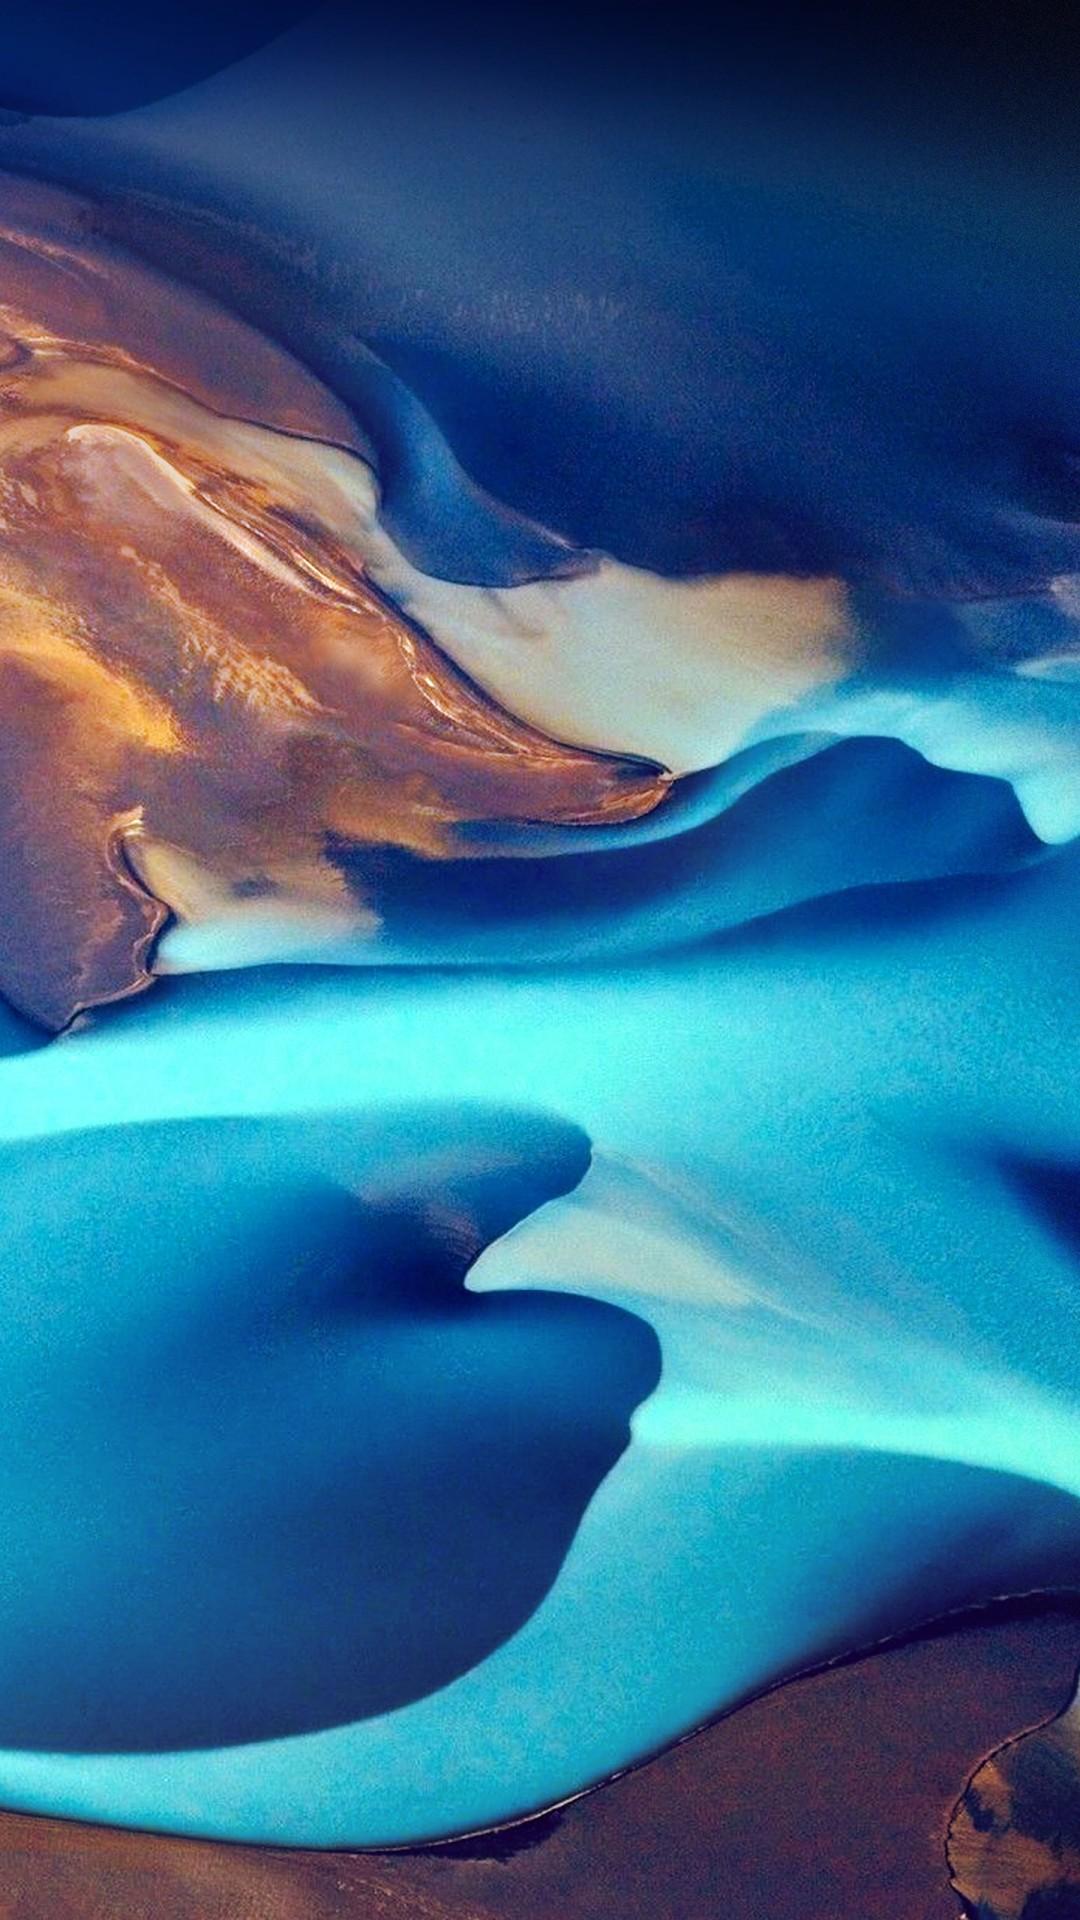 Wallpaper Samsung Galaxy S10 Abstract Colorful Hd Os 21439